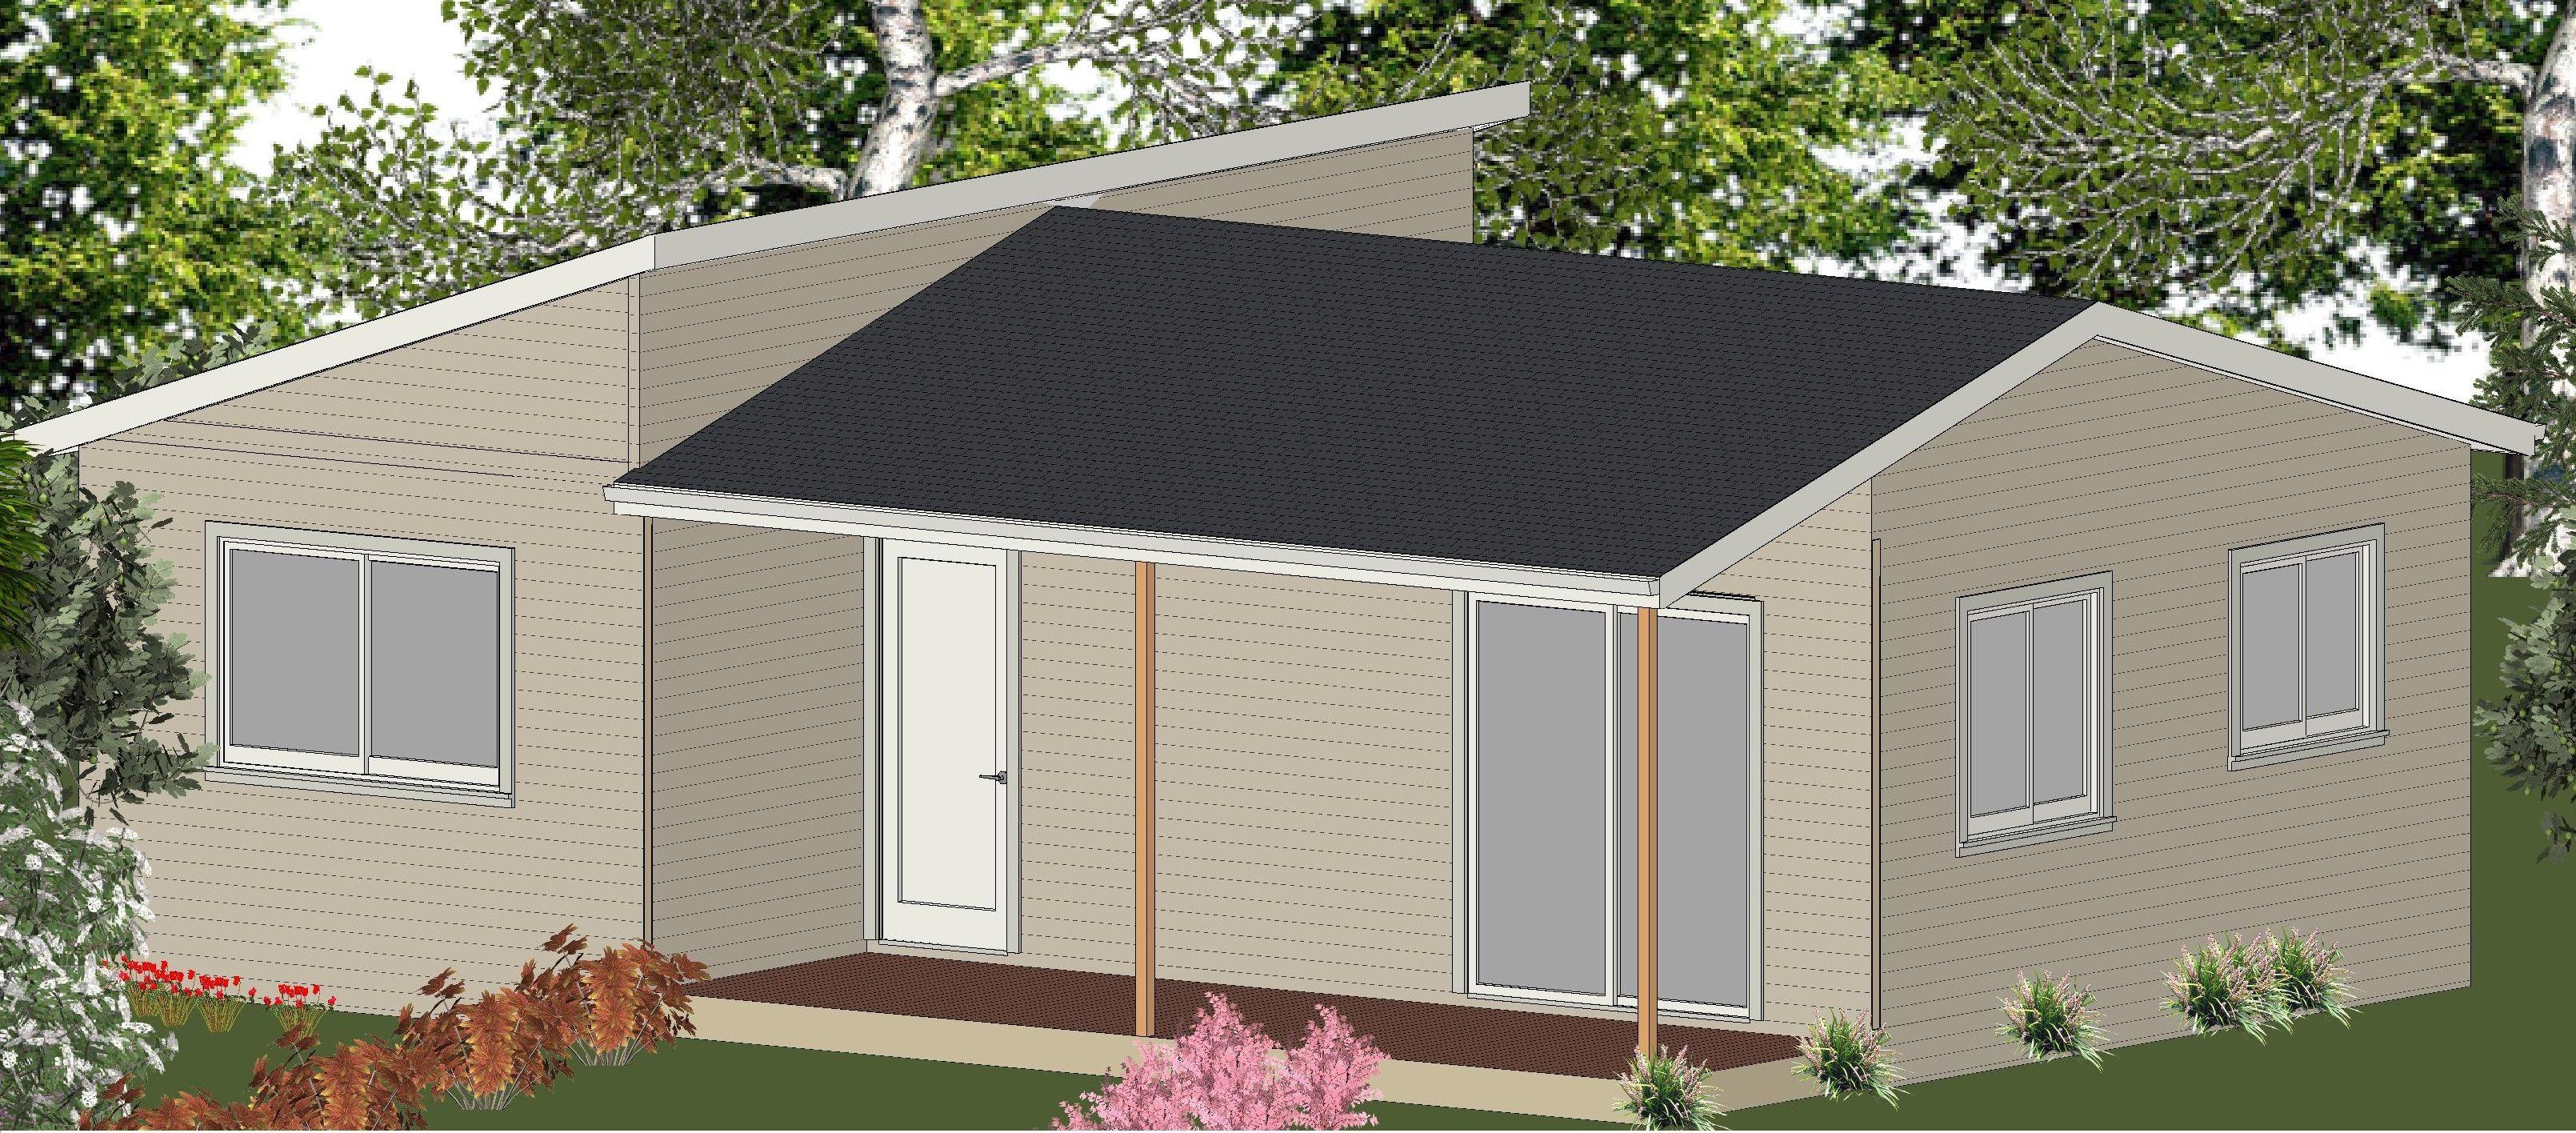 Swell Brisbane Granny Flat Design The Cabin 60M2 Granny Flat Interior Design Ideas Pimpapslepicentreinfo